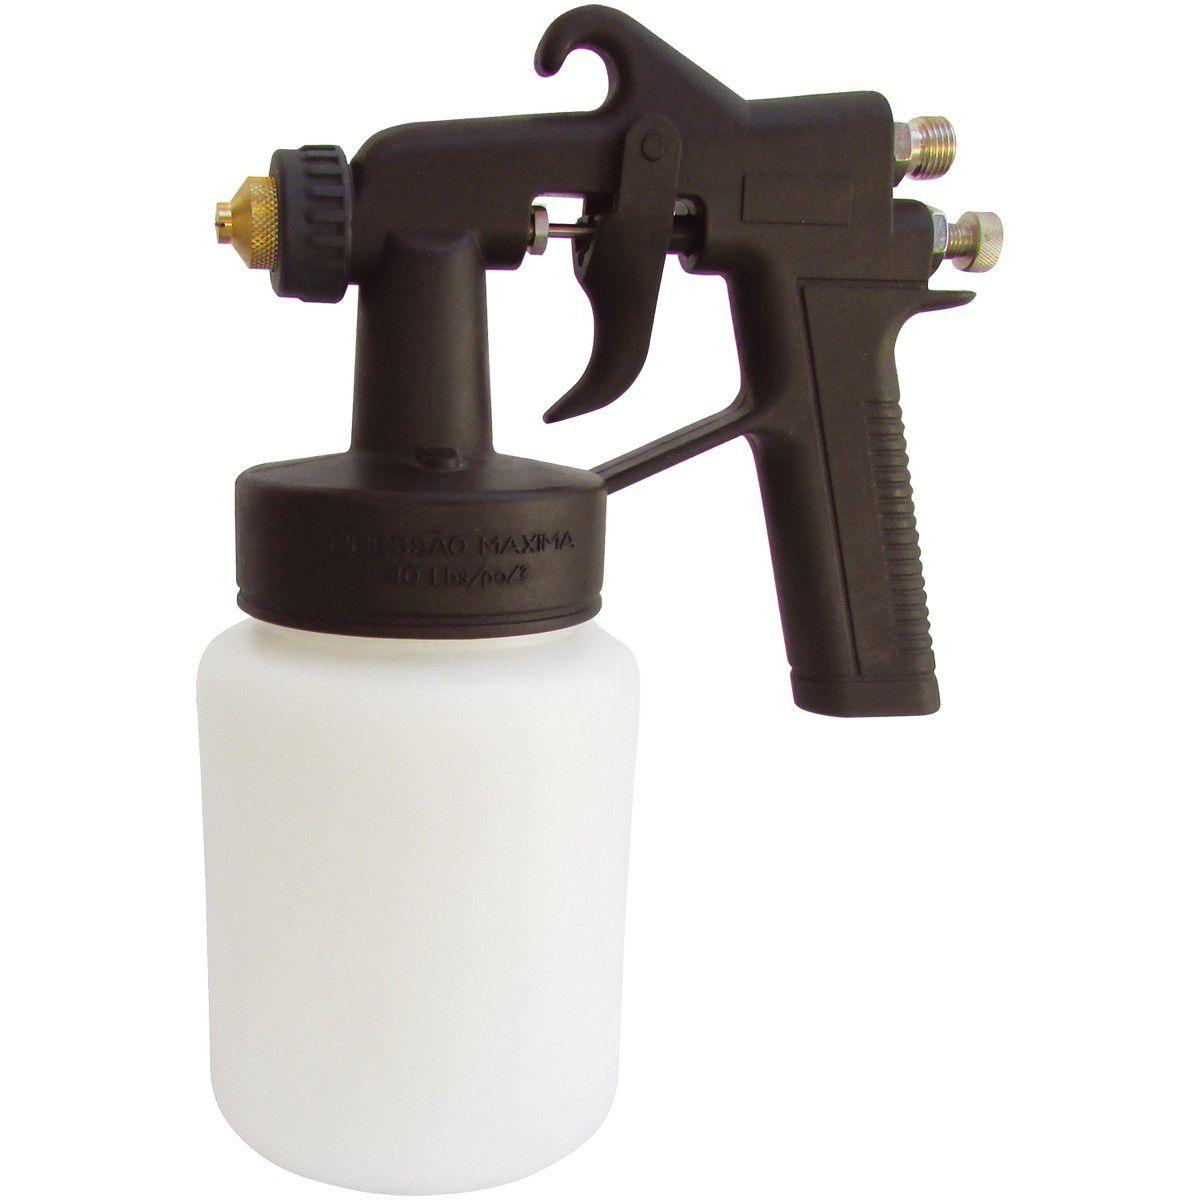 Pistola De Ar P472 Intech Machine